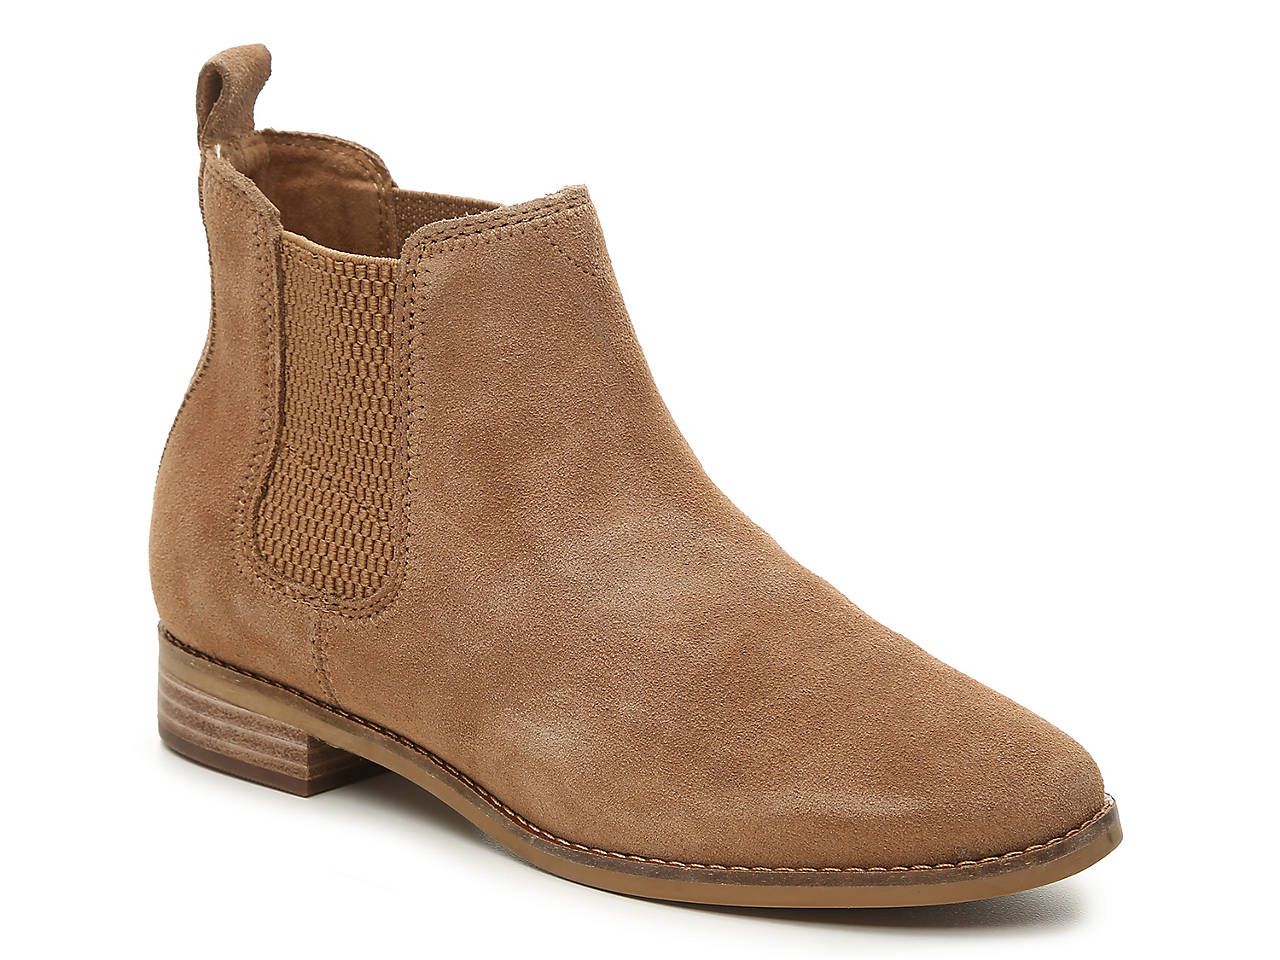 d0142b7f4ed152 TOMS Ella Chelsea Boot Women s Shoes